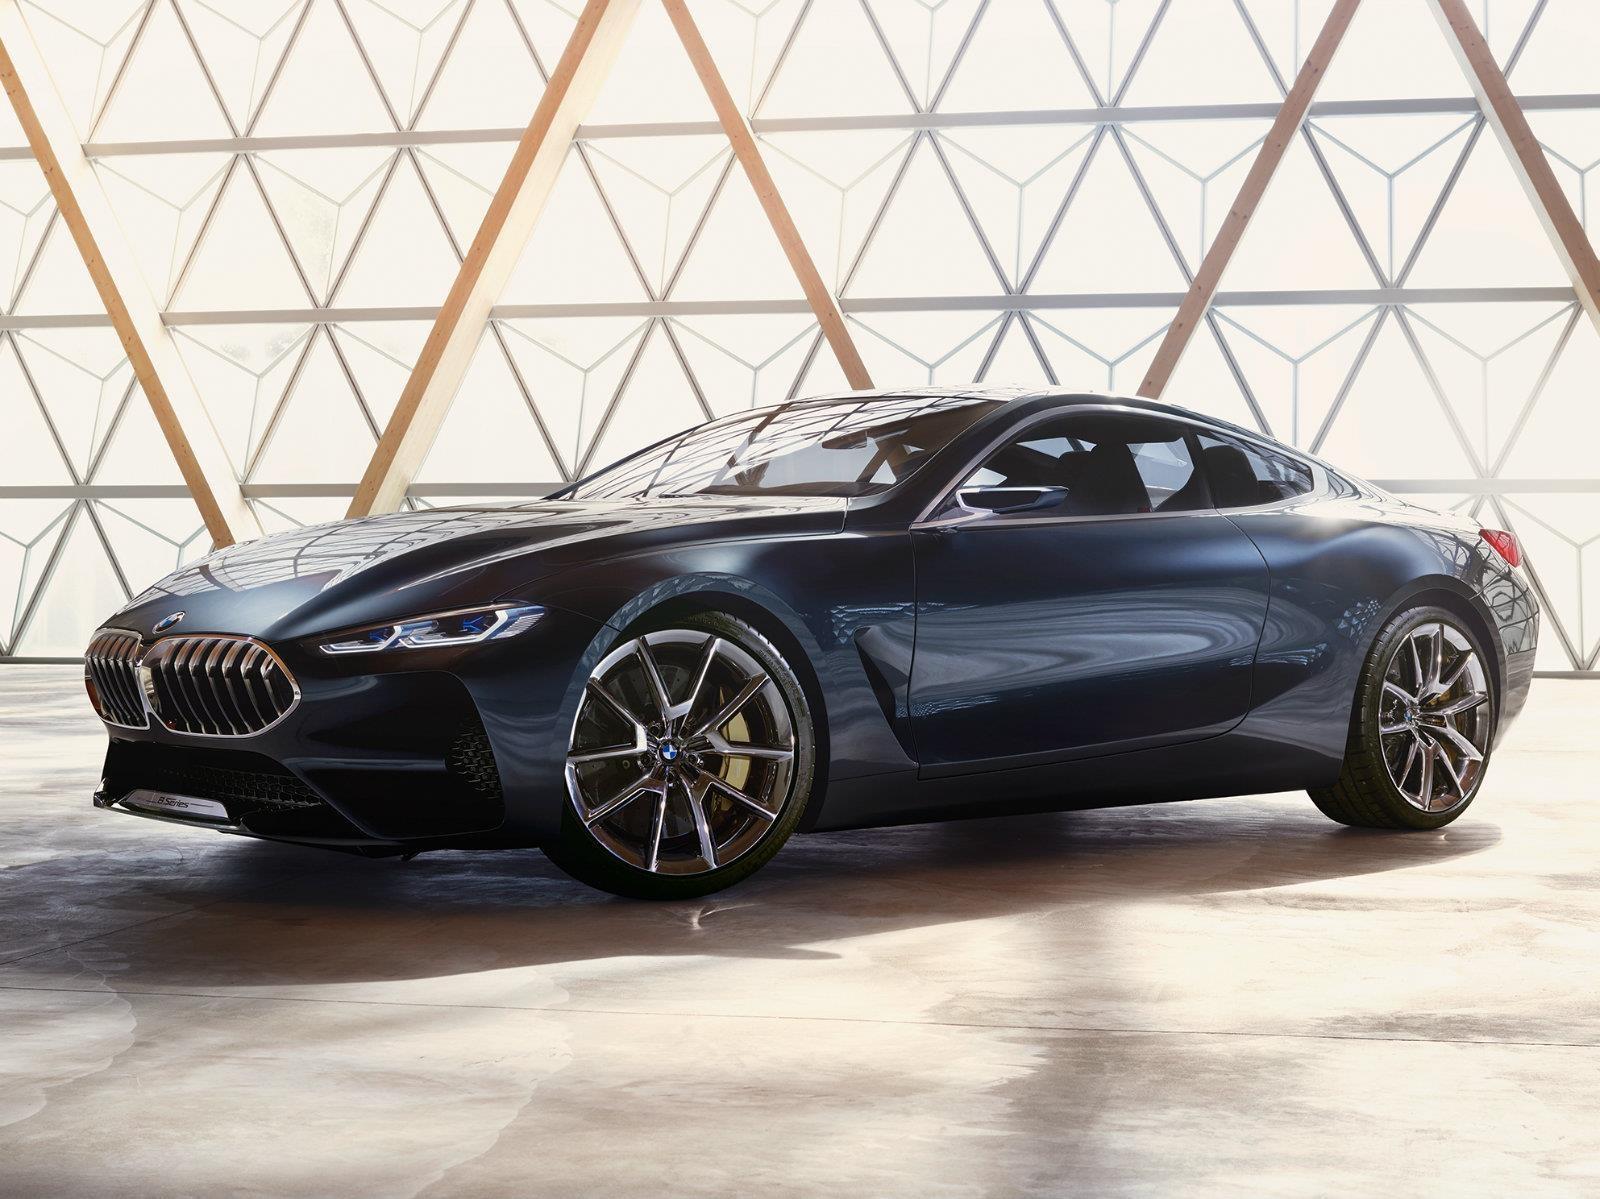 BMW Serie 8 concept, una cupé que se viene en 2018